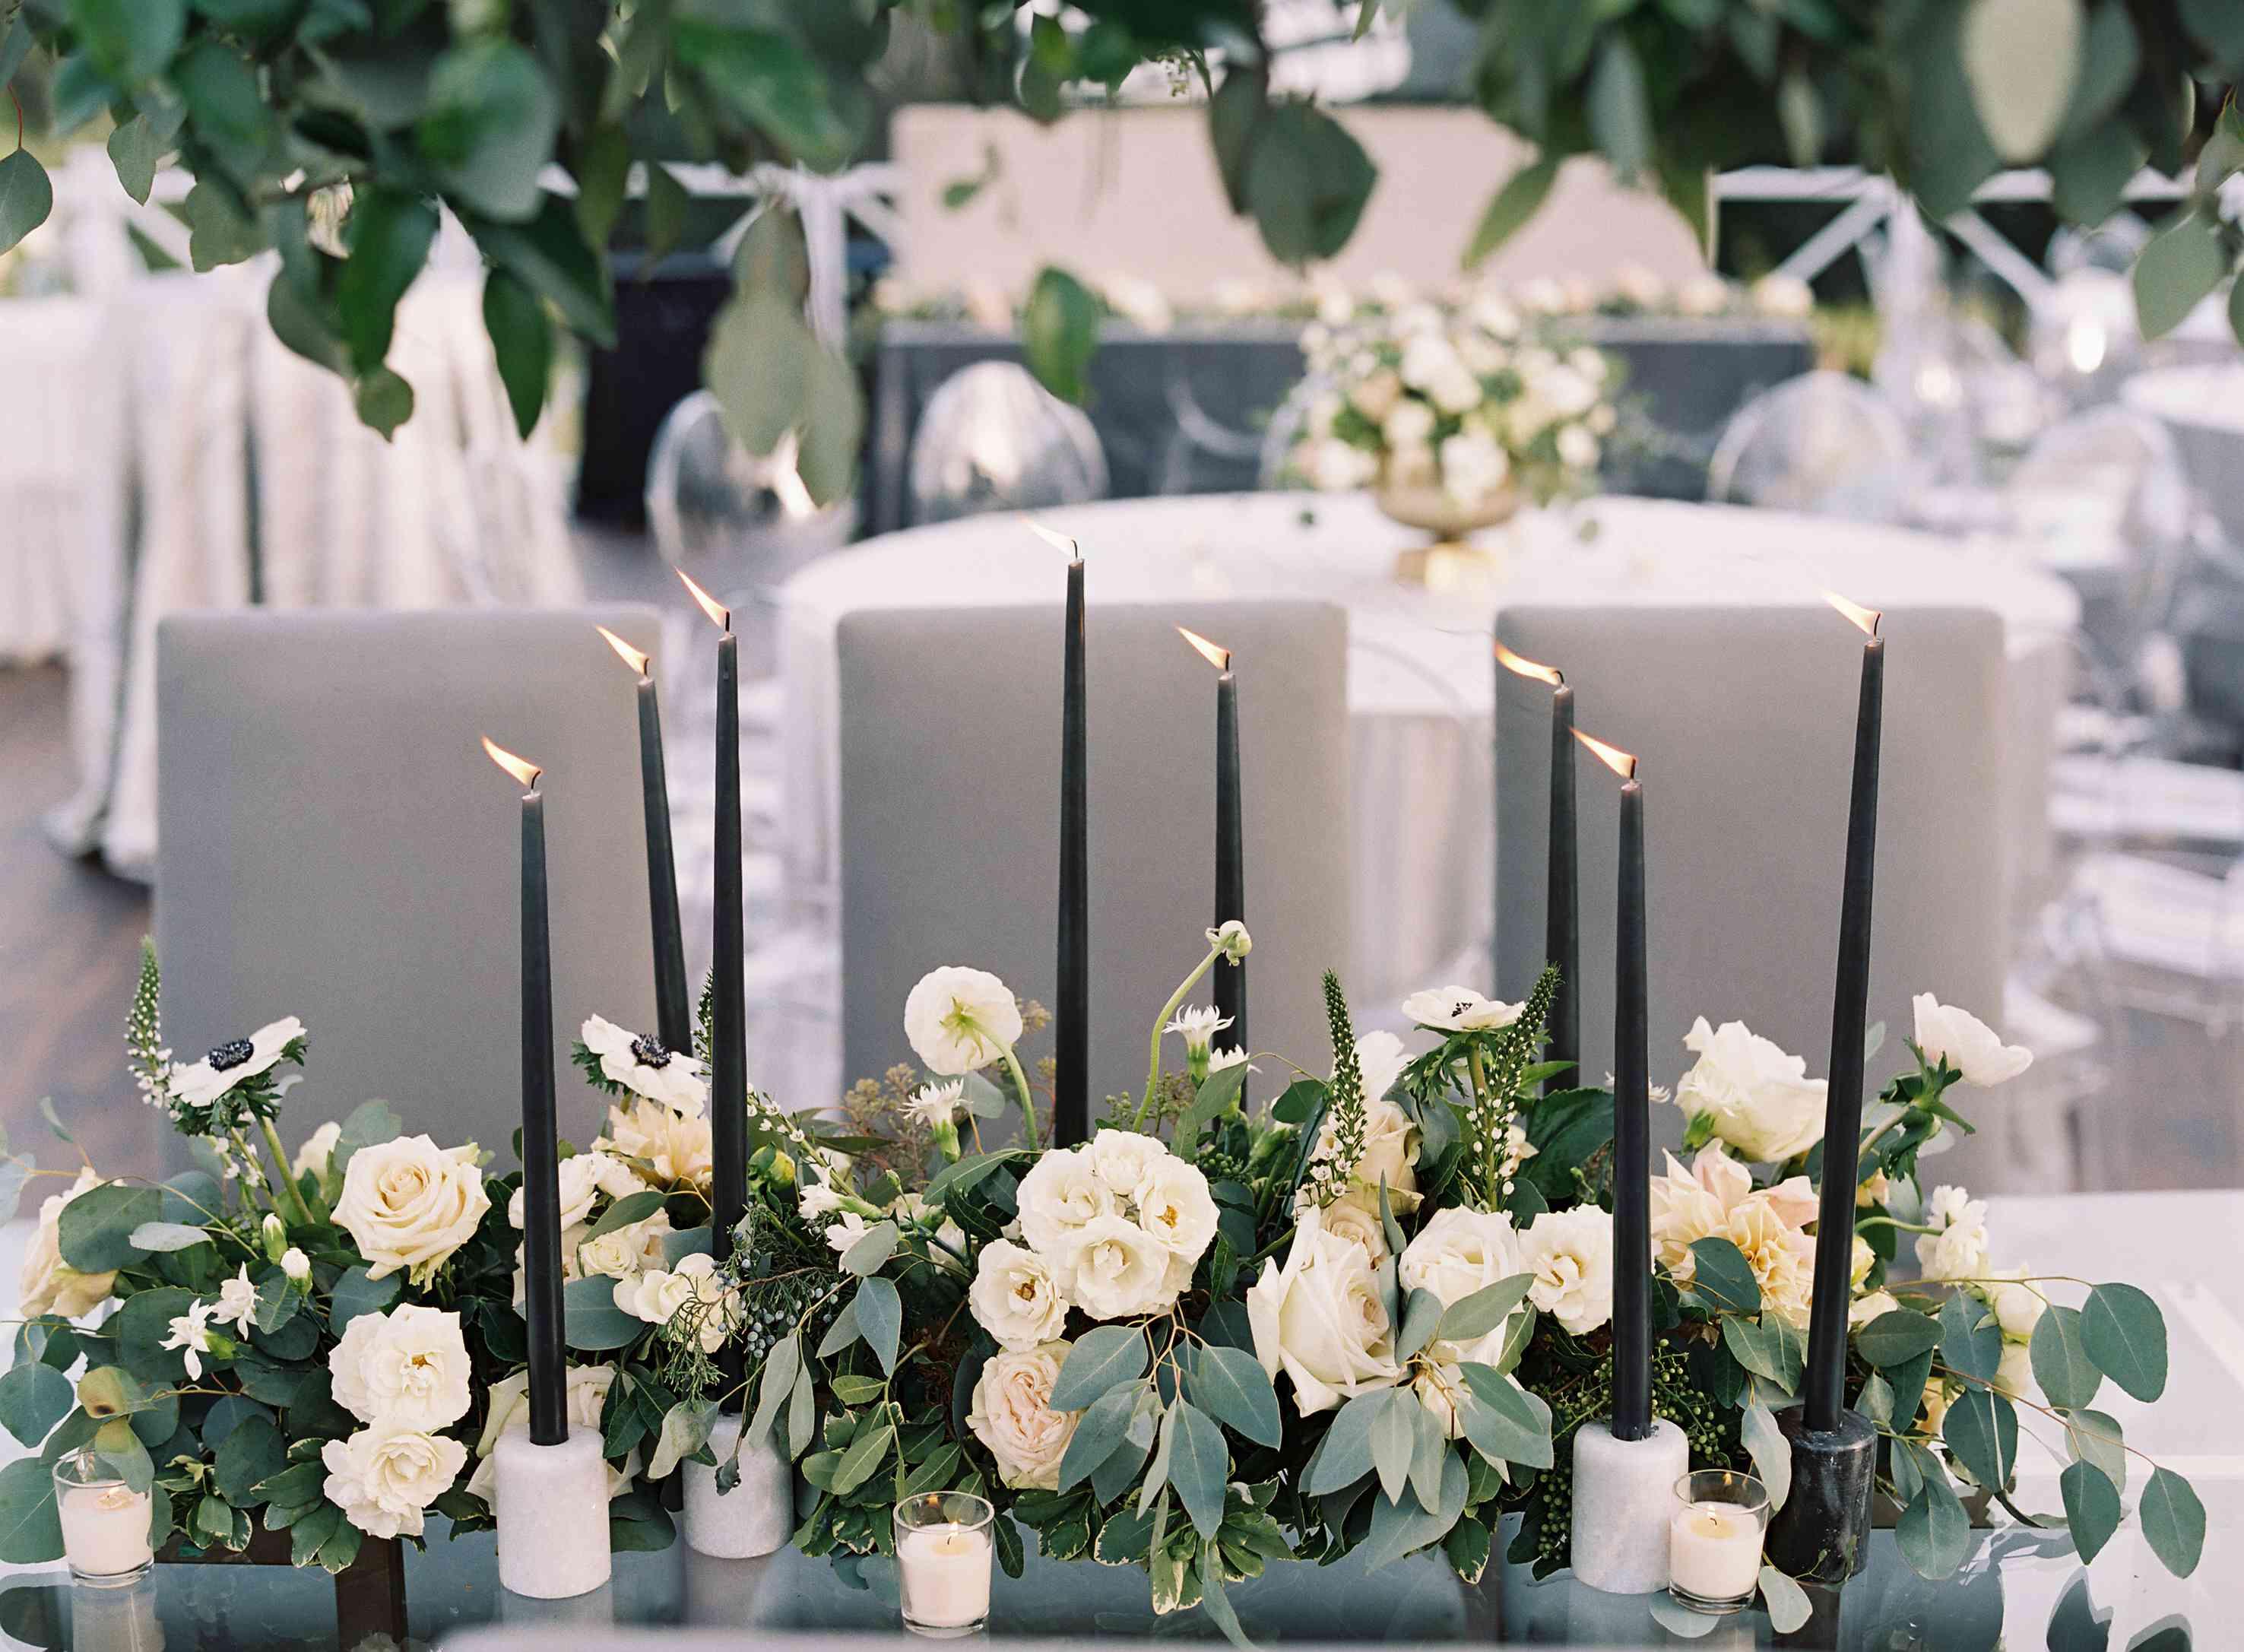 <p>Candlelit table centerpiece</p><br><br>